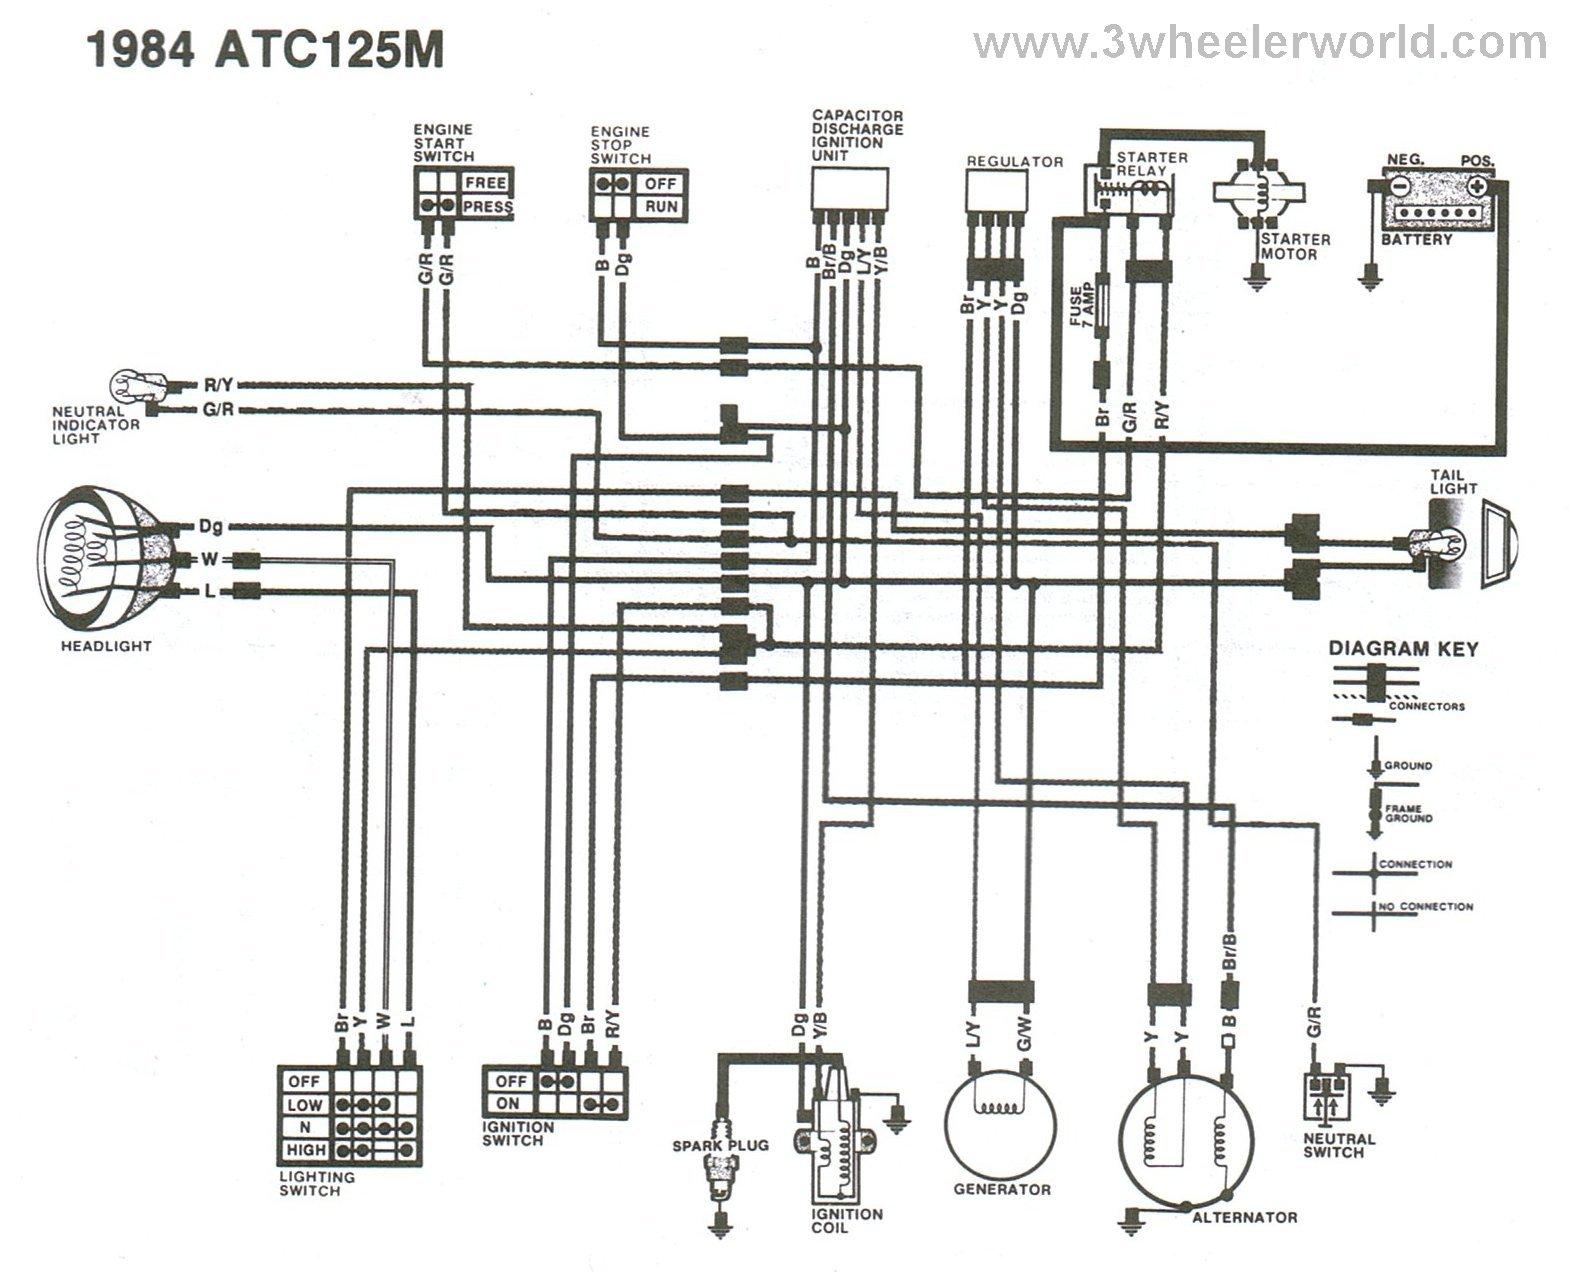 Stupendous 200M Wiring Diagram Wiring Diagram Wiring 101 Archstreekradiomeanderfmnl